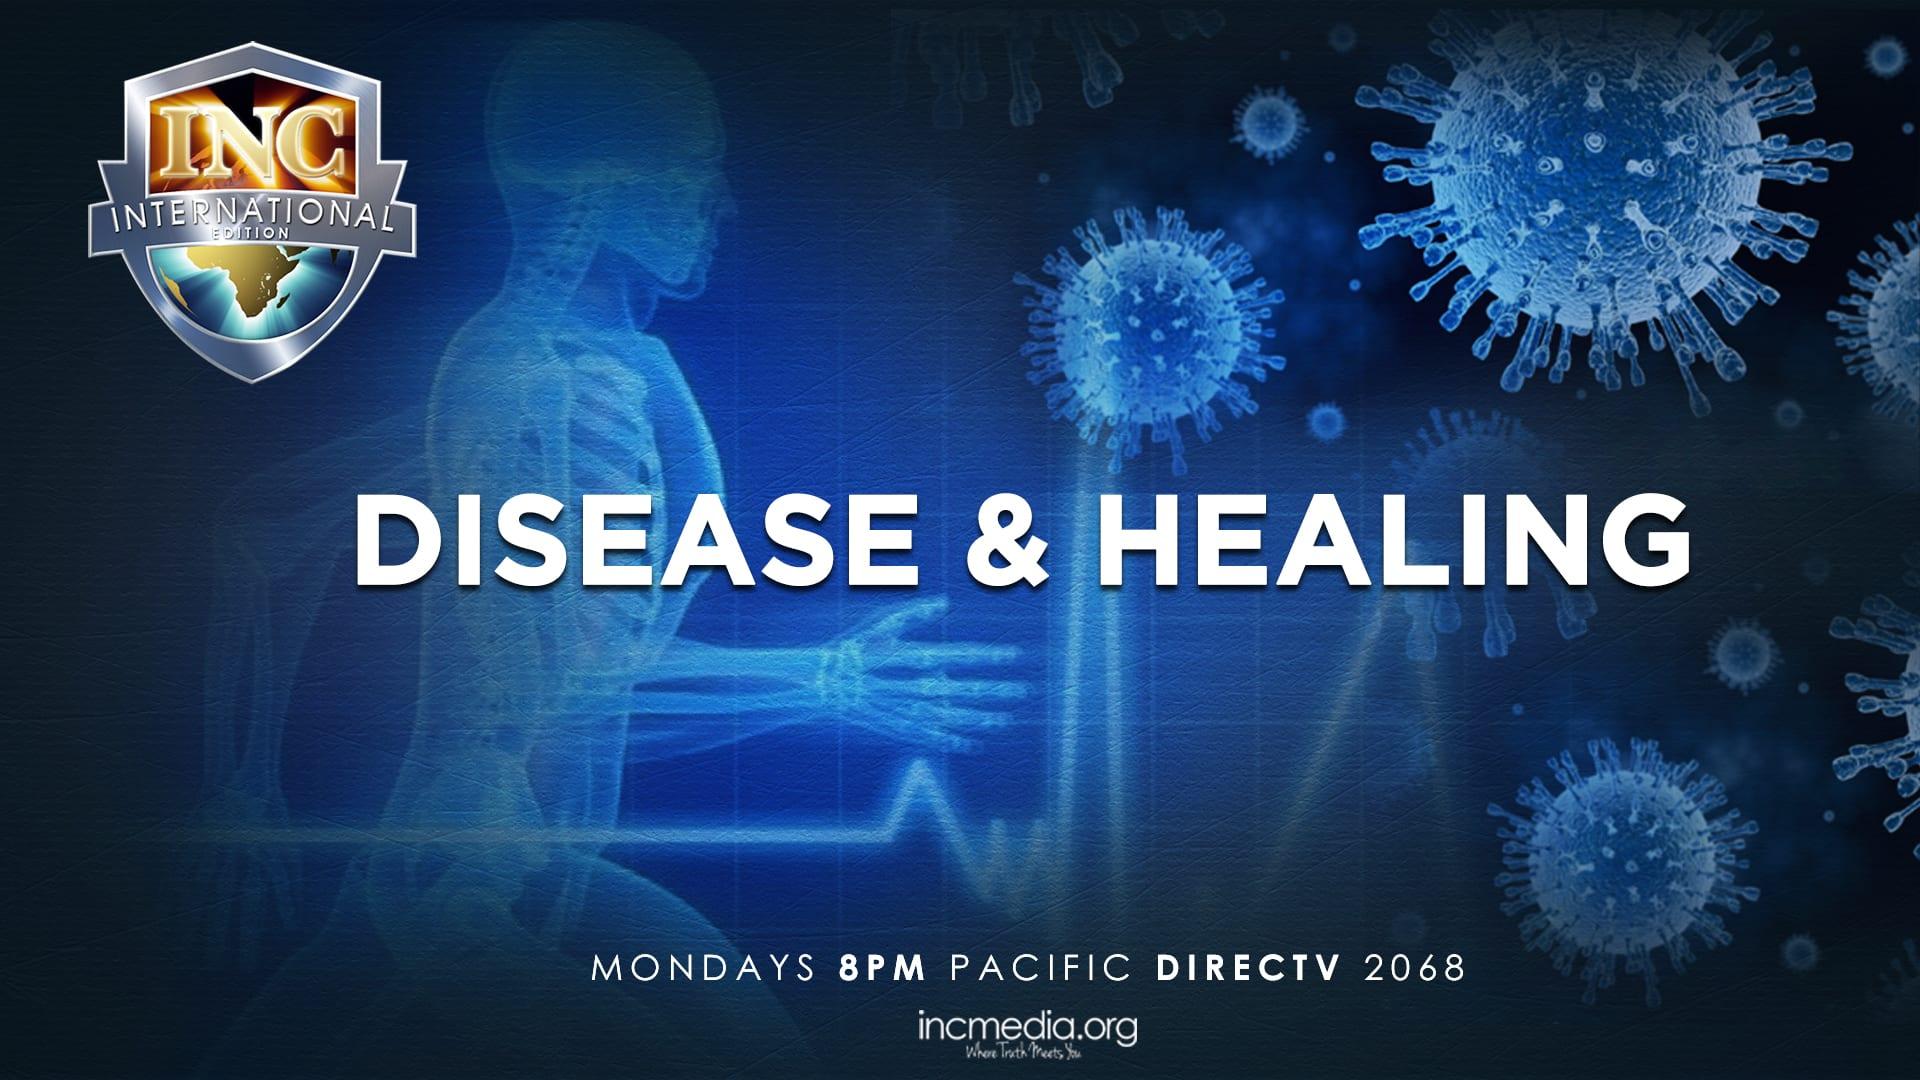 Disease and Healing